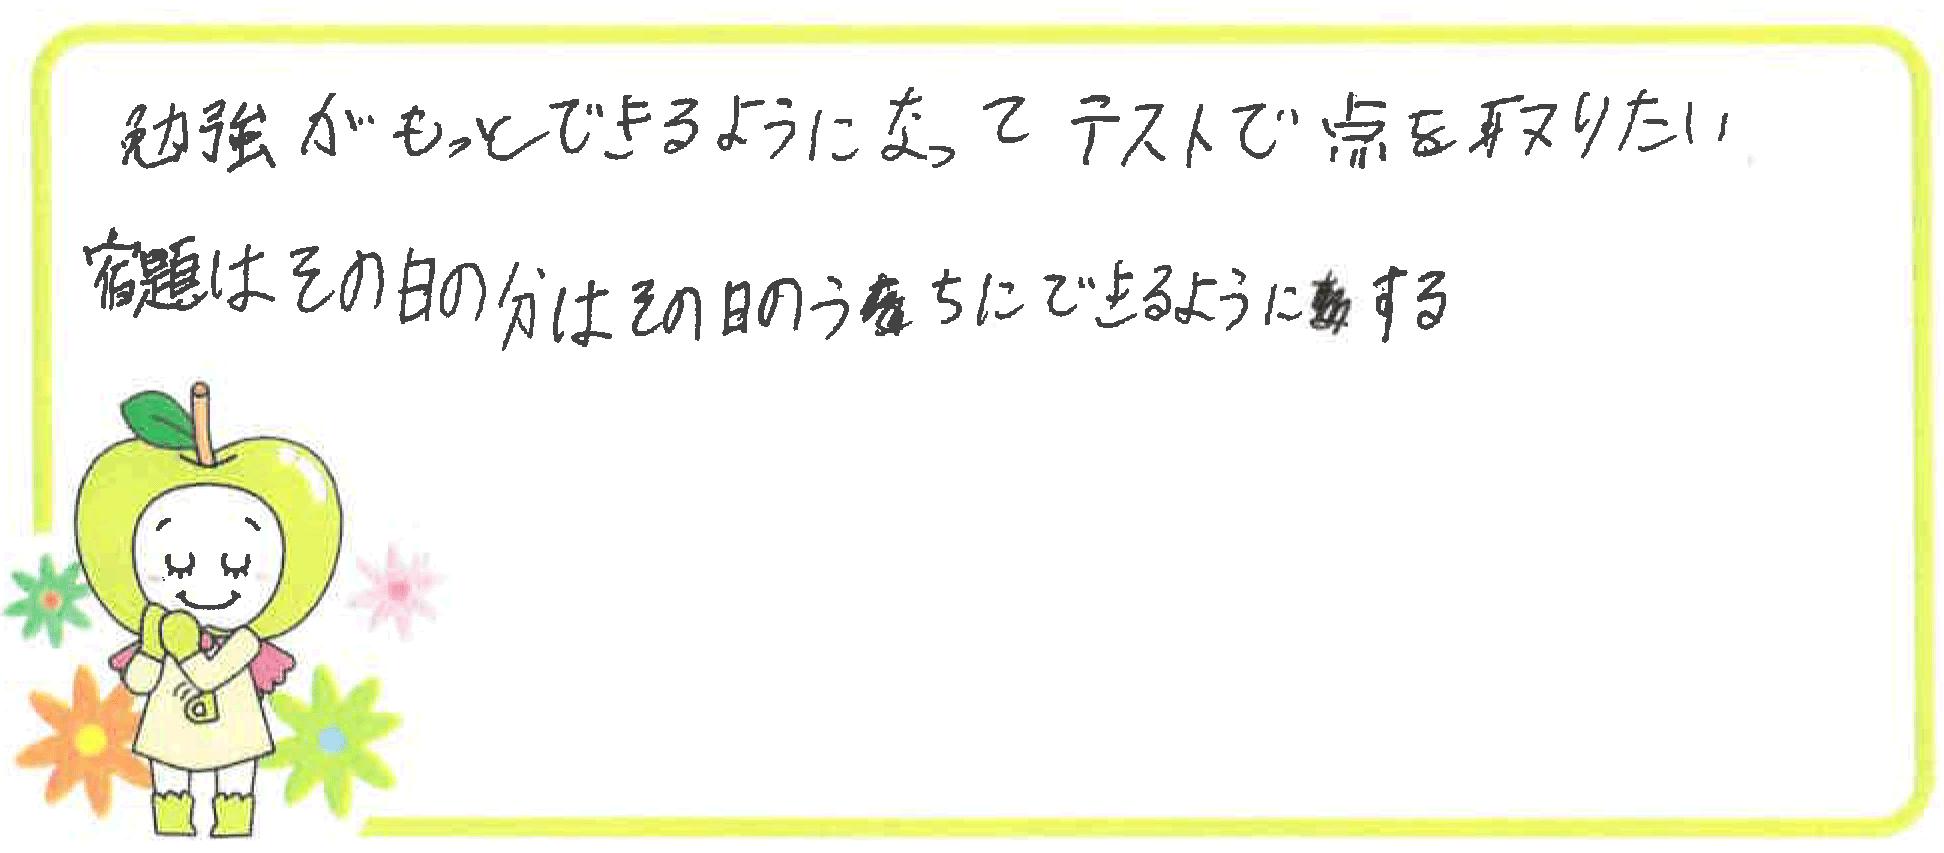 A君(堺市)からの口コミ